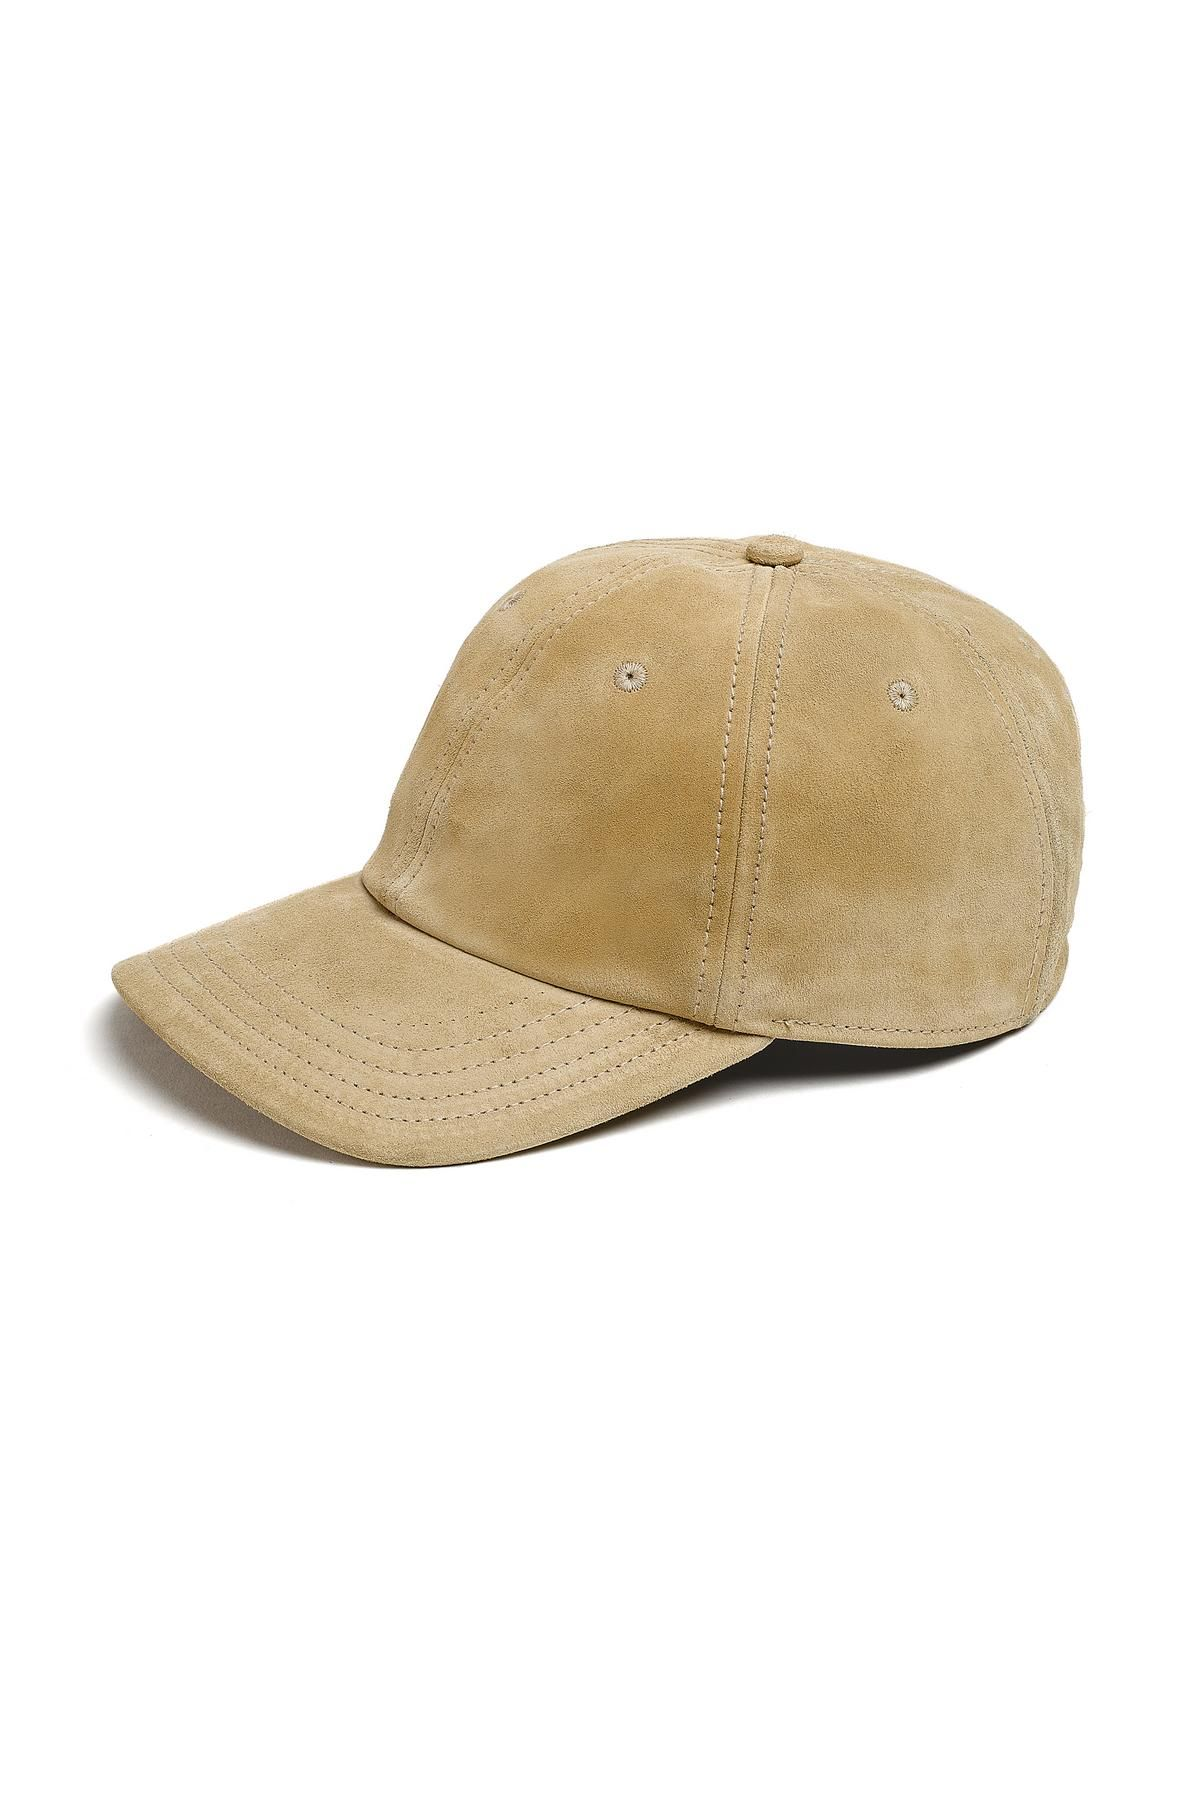 3a3bec15fea SUEDE BASEBALL CAP